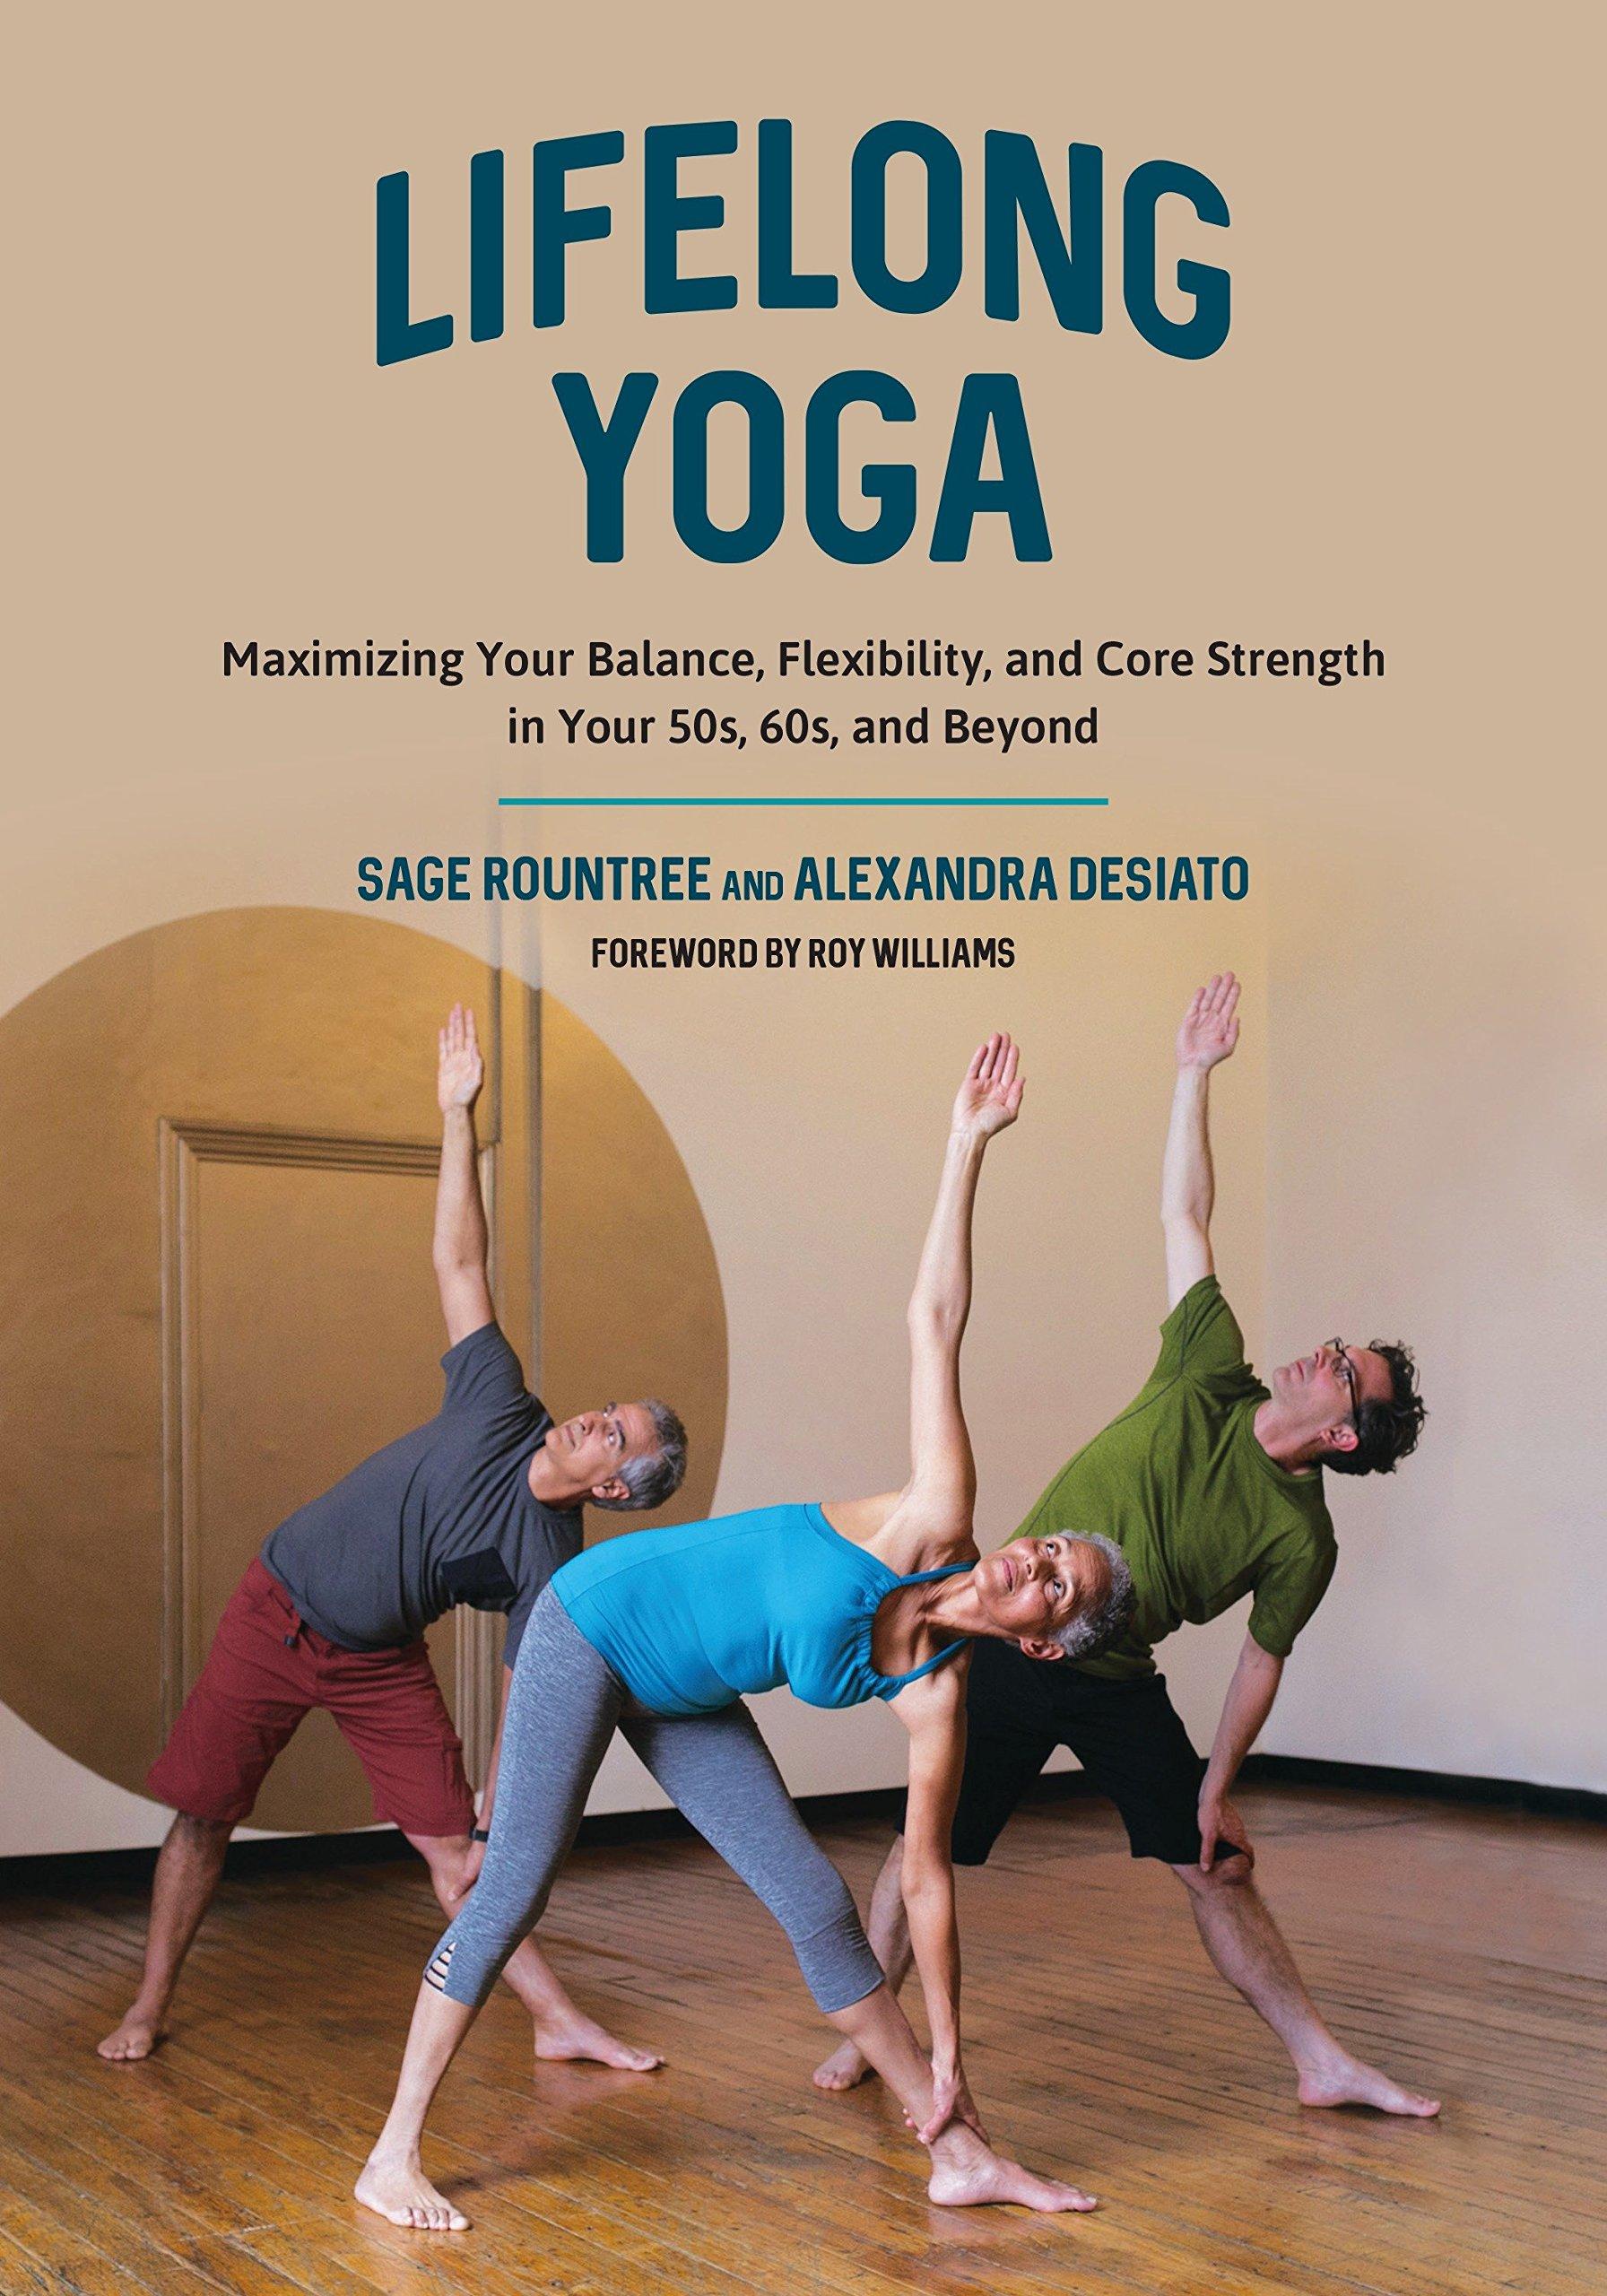 2ce300a32afae Lifelong Yoga: Maximizing Your Balance, Flexibility, and Core ...